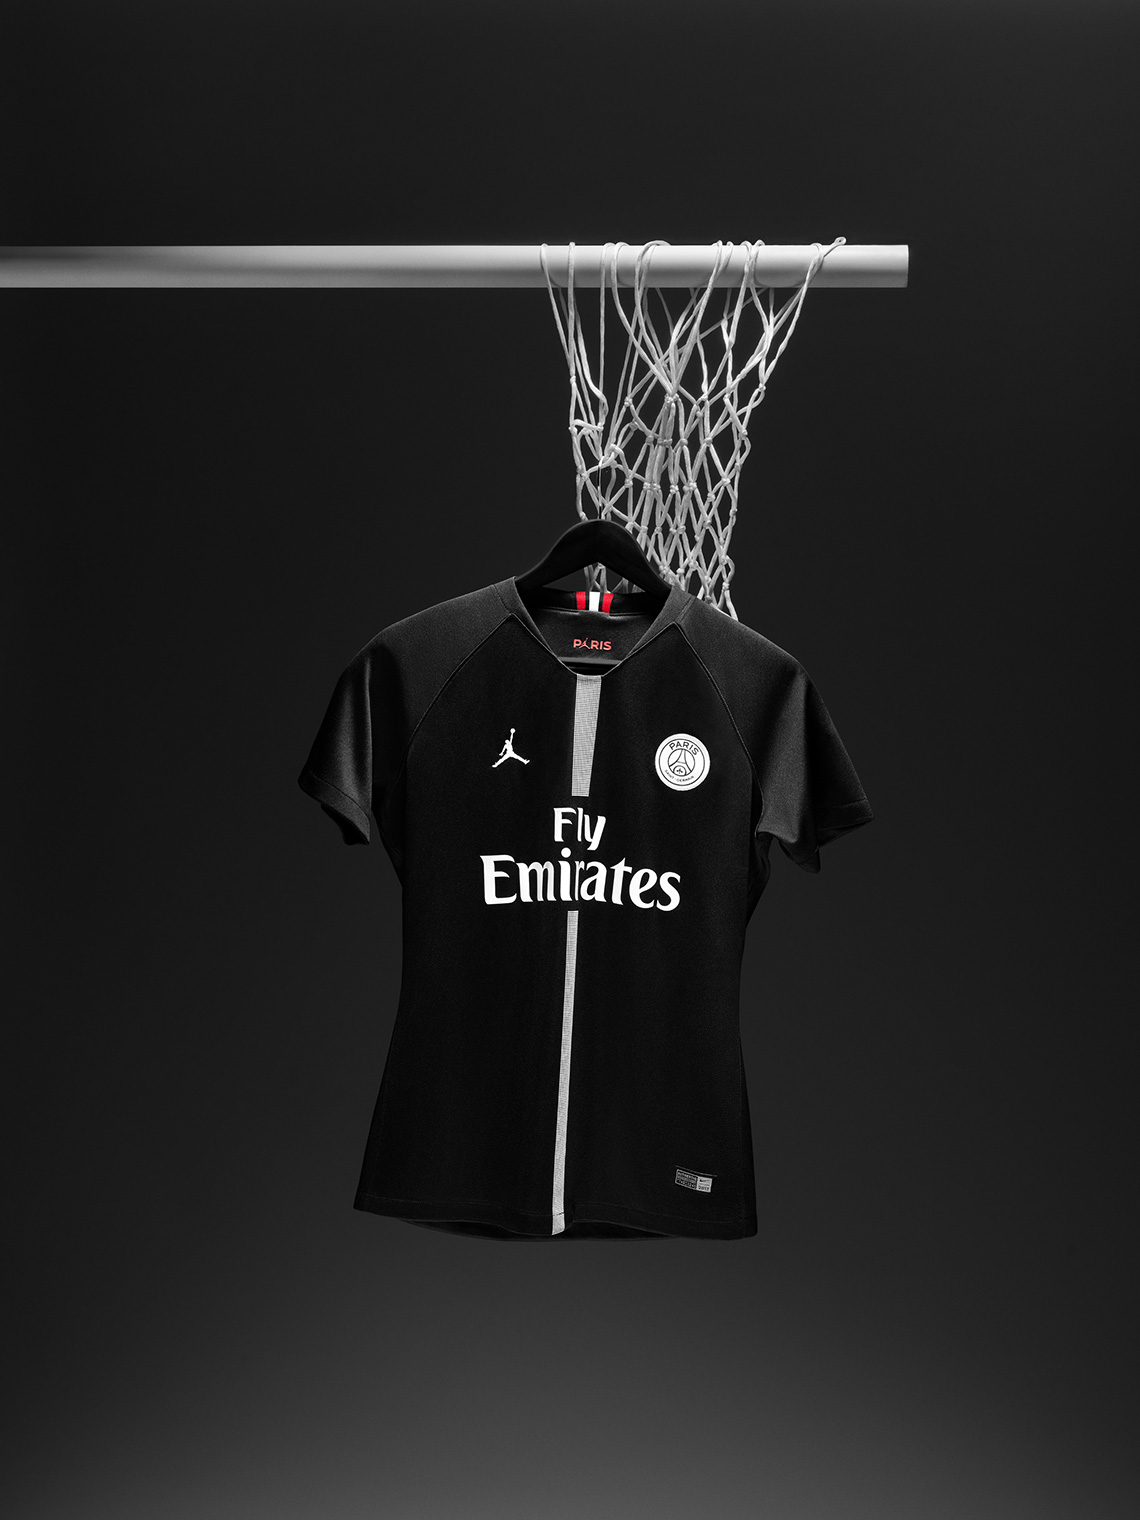 7a0679b2501264 Jordan 5 PSG Paris Saint-Germain - Where To Buy